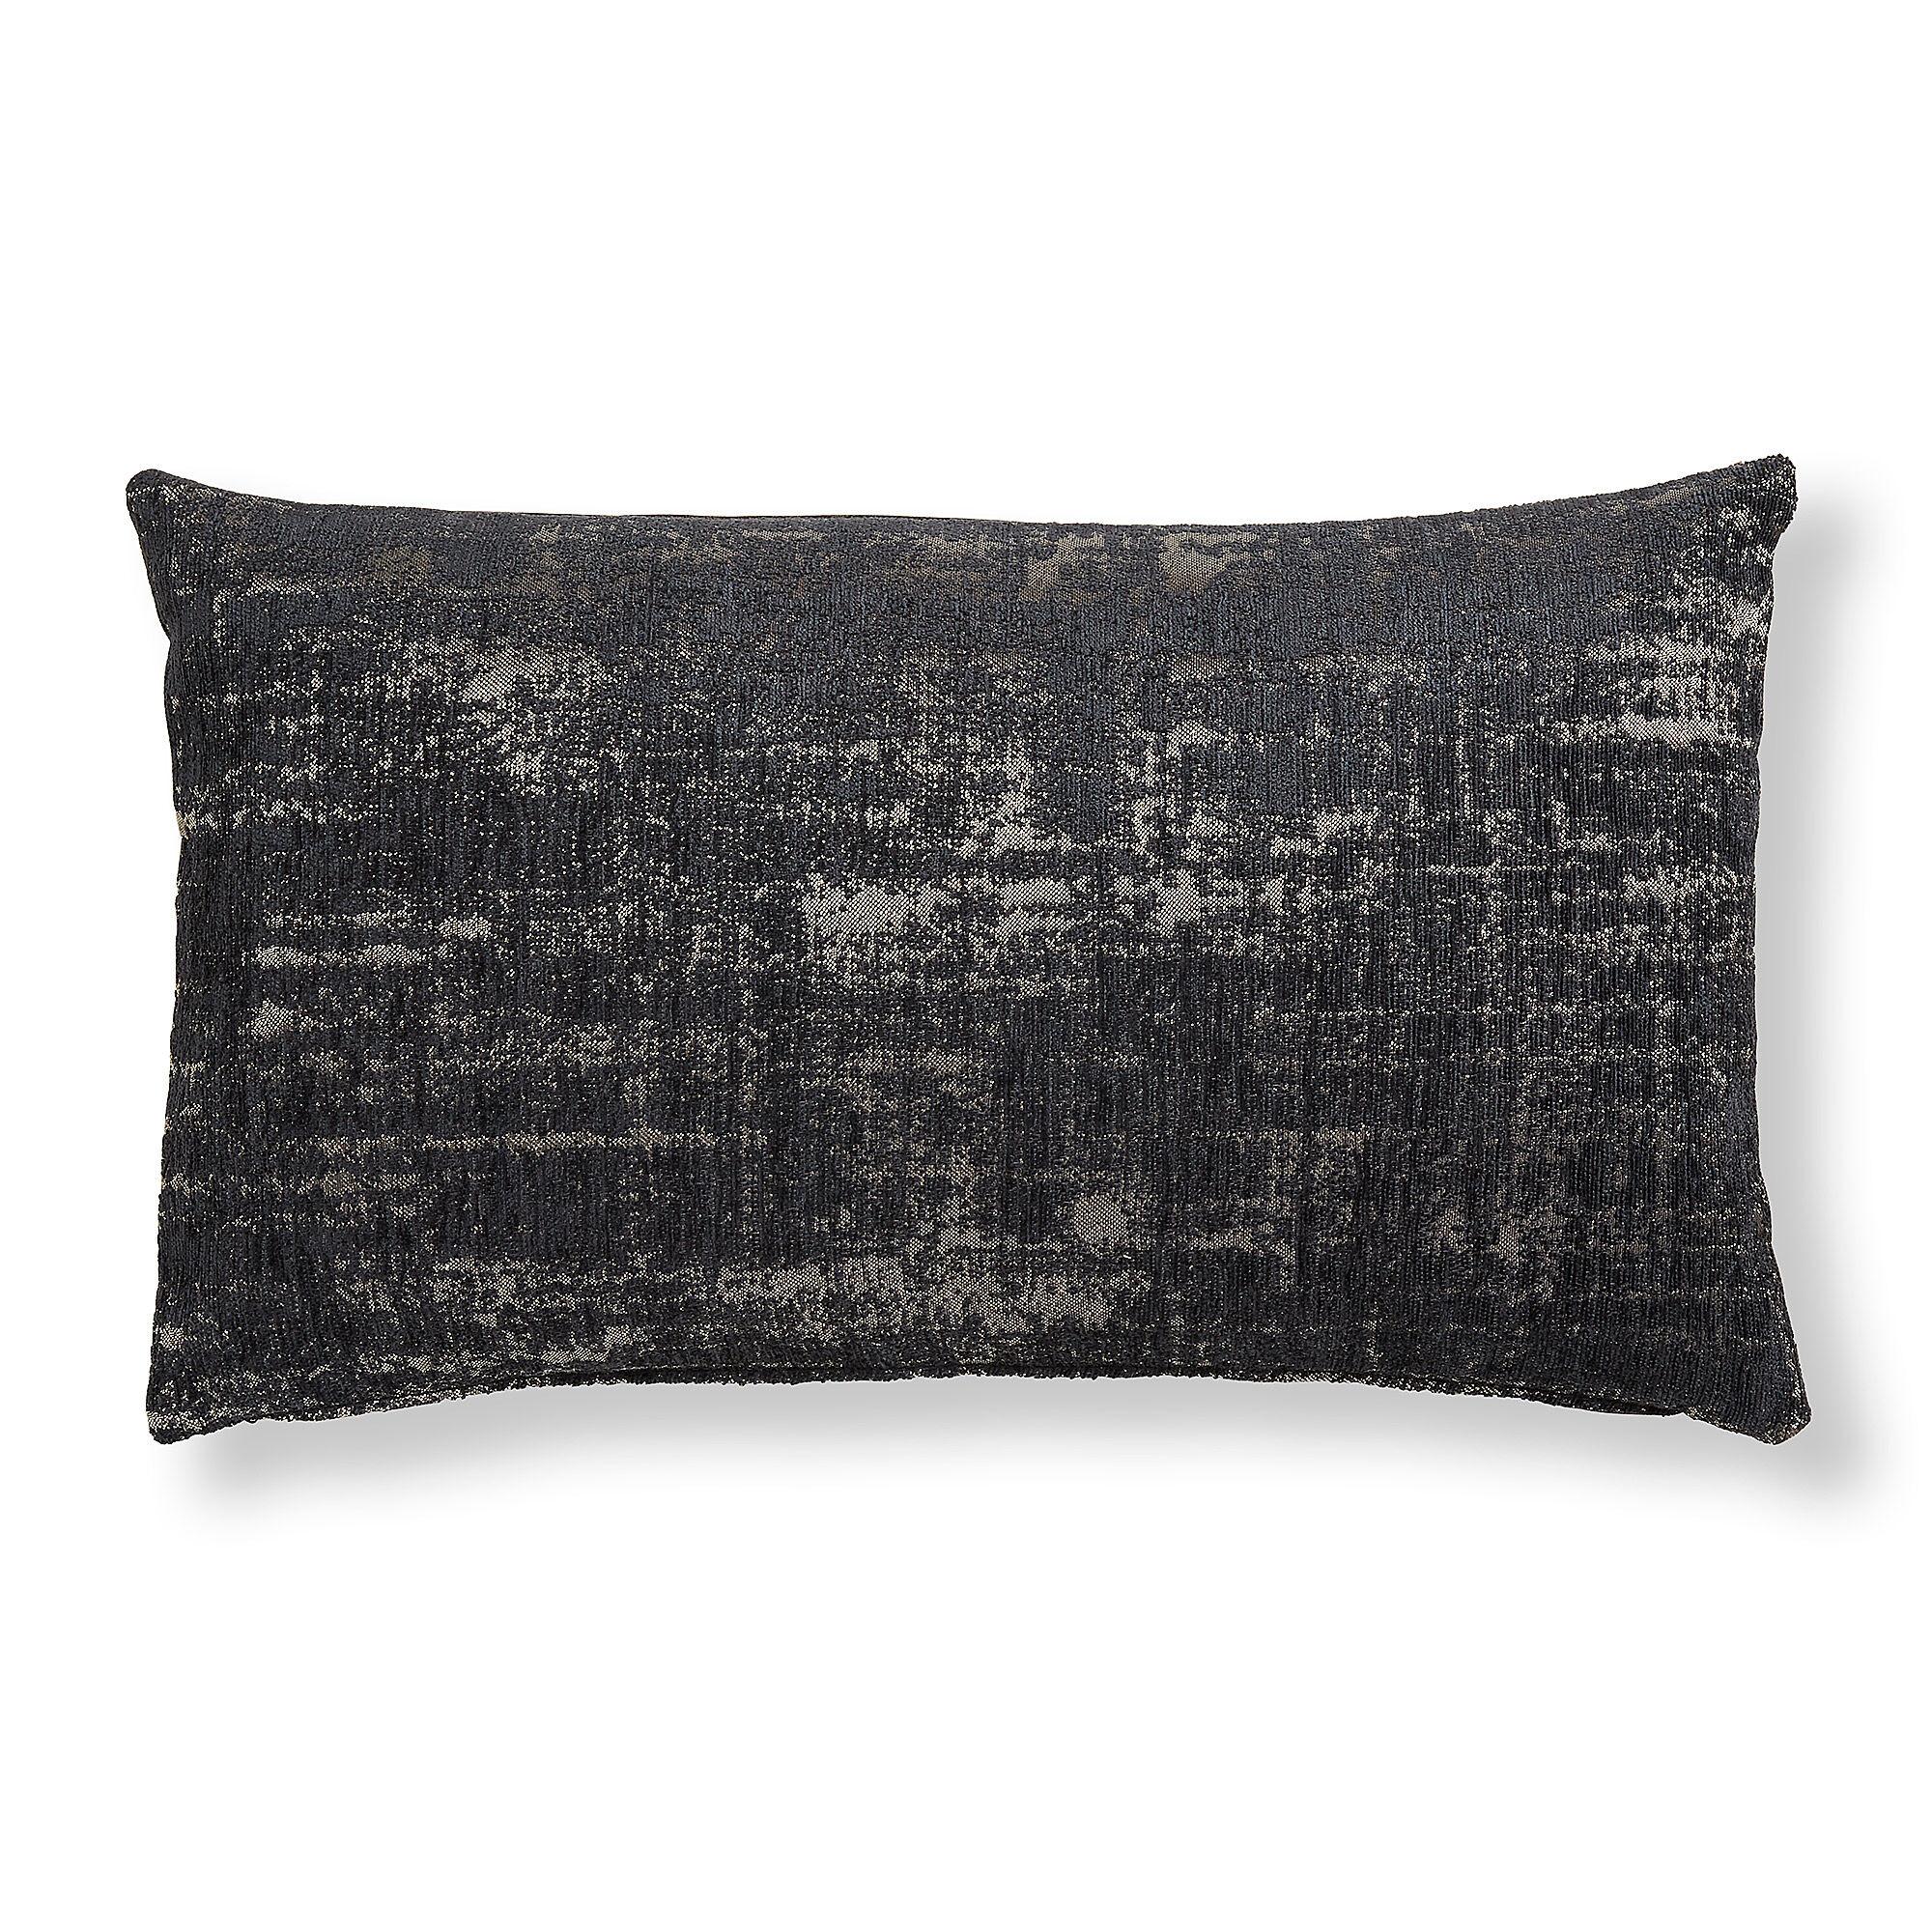 Kave Home Fodera cuscino Nazca 30 x 50 cm nero